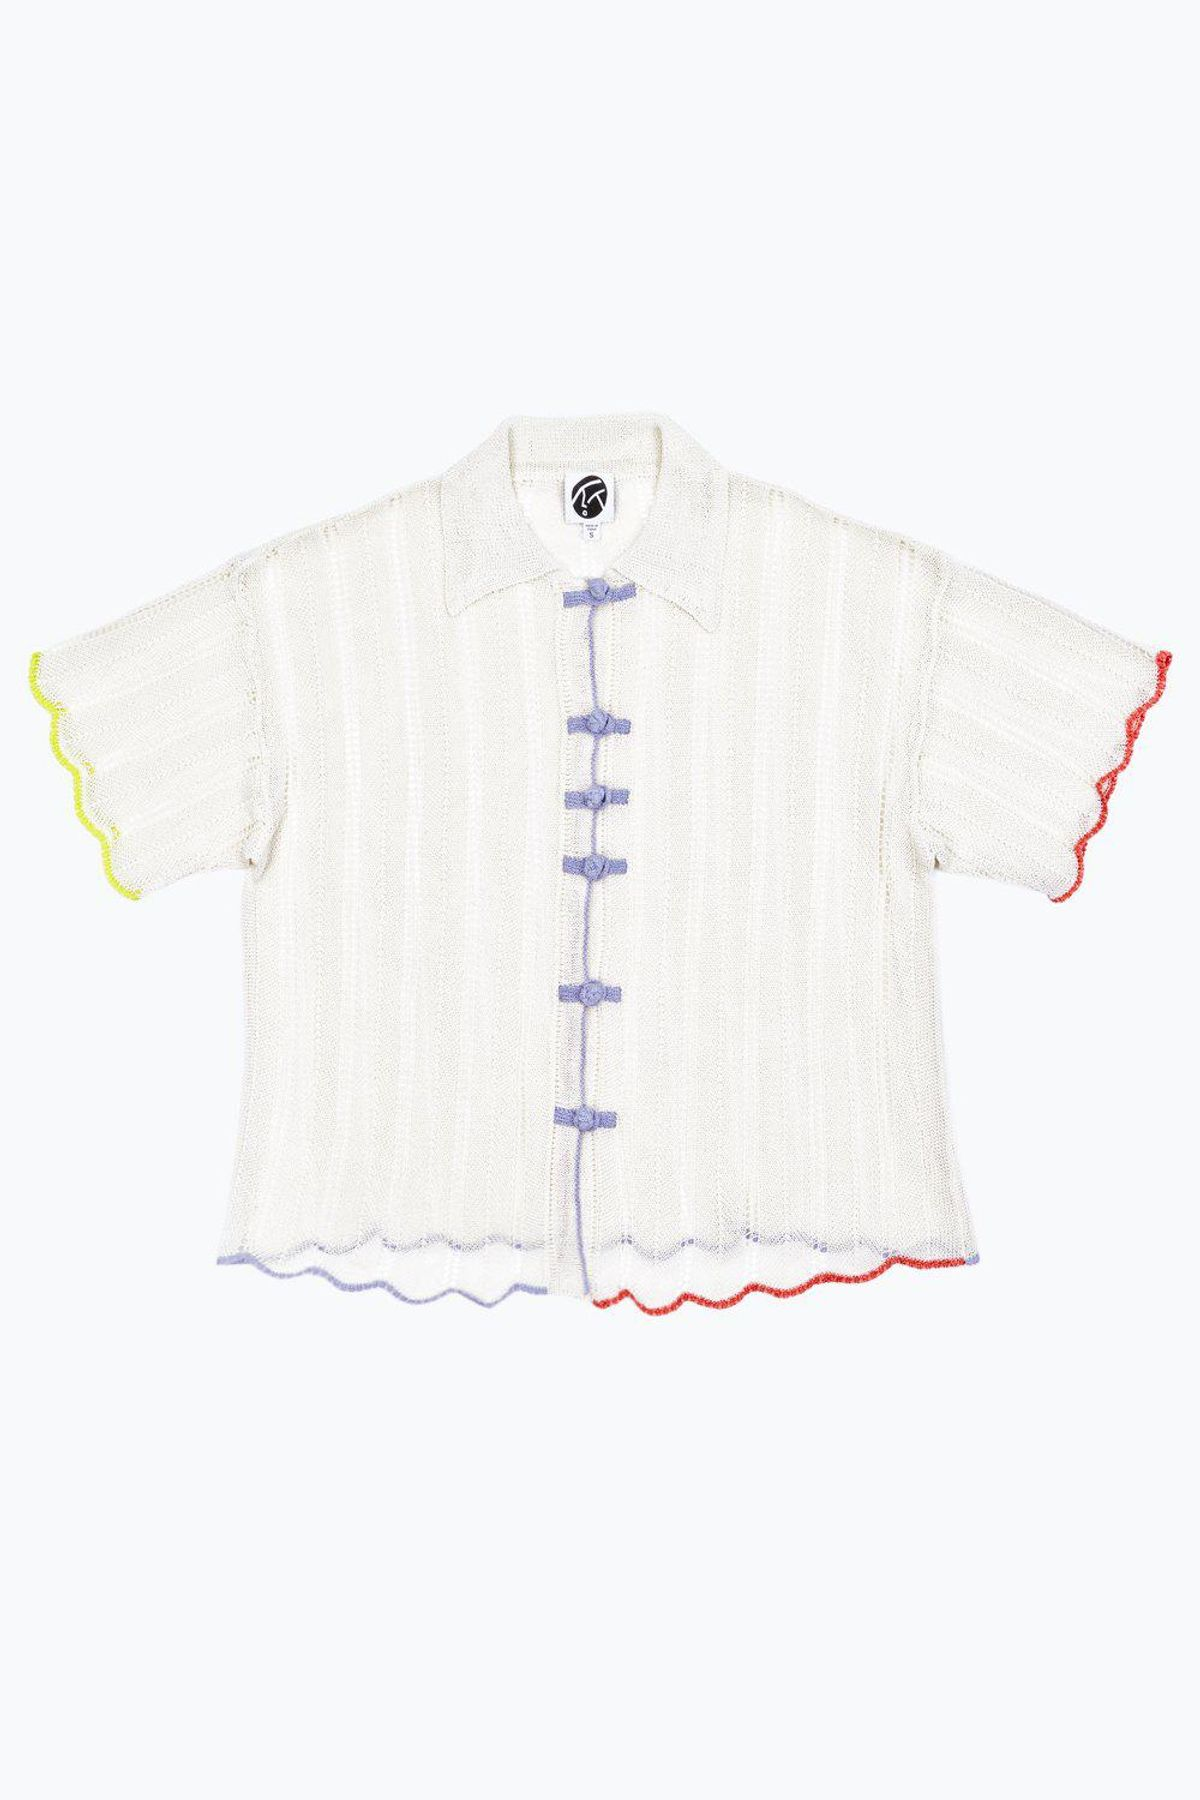 yanyan knits honey grandpa short sleeve shirt in ivory cotton cord